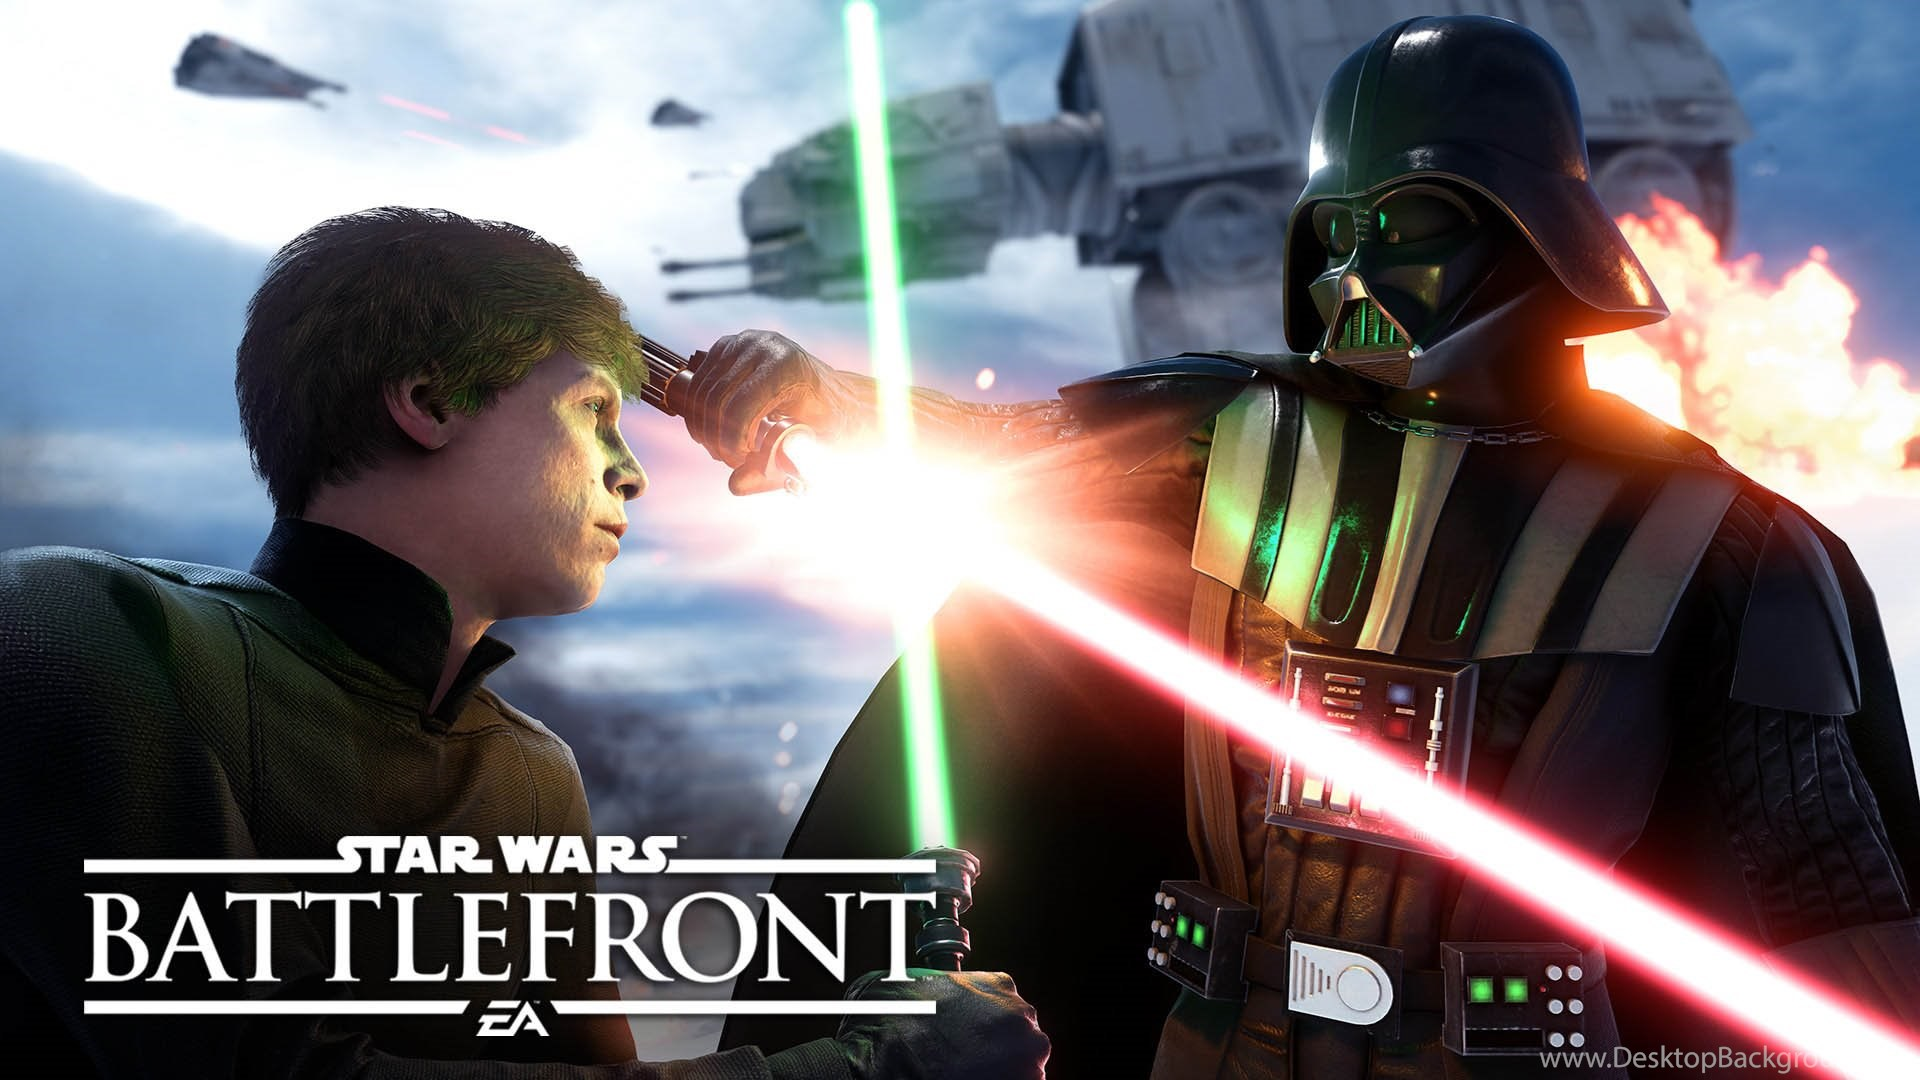 Luke Skywalker Vs Darth Vader Star Wars Battlefront 1920x1080